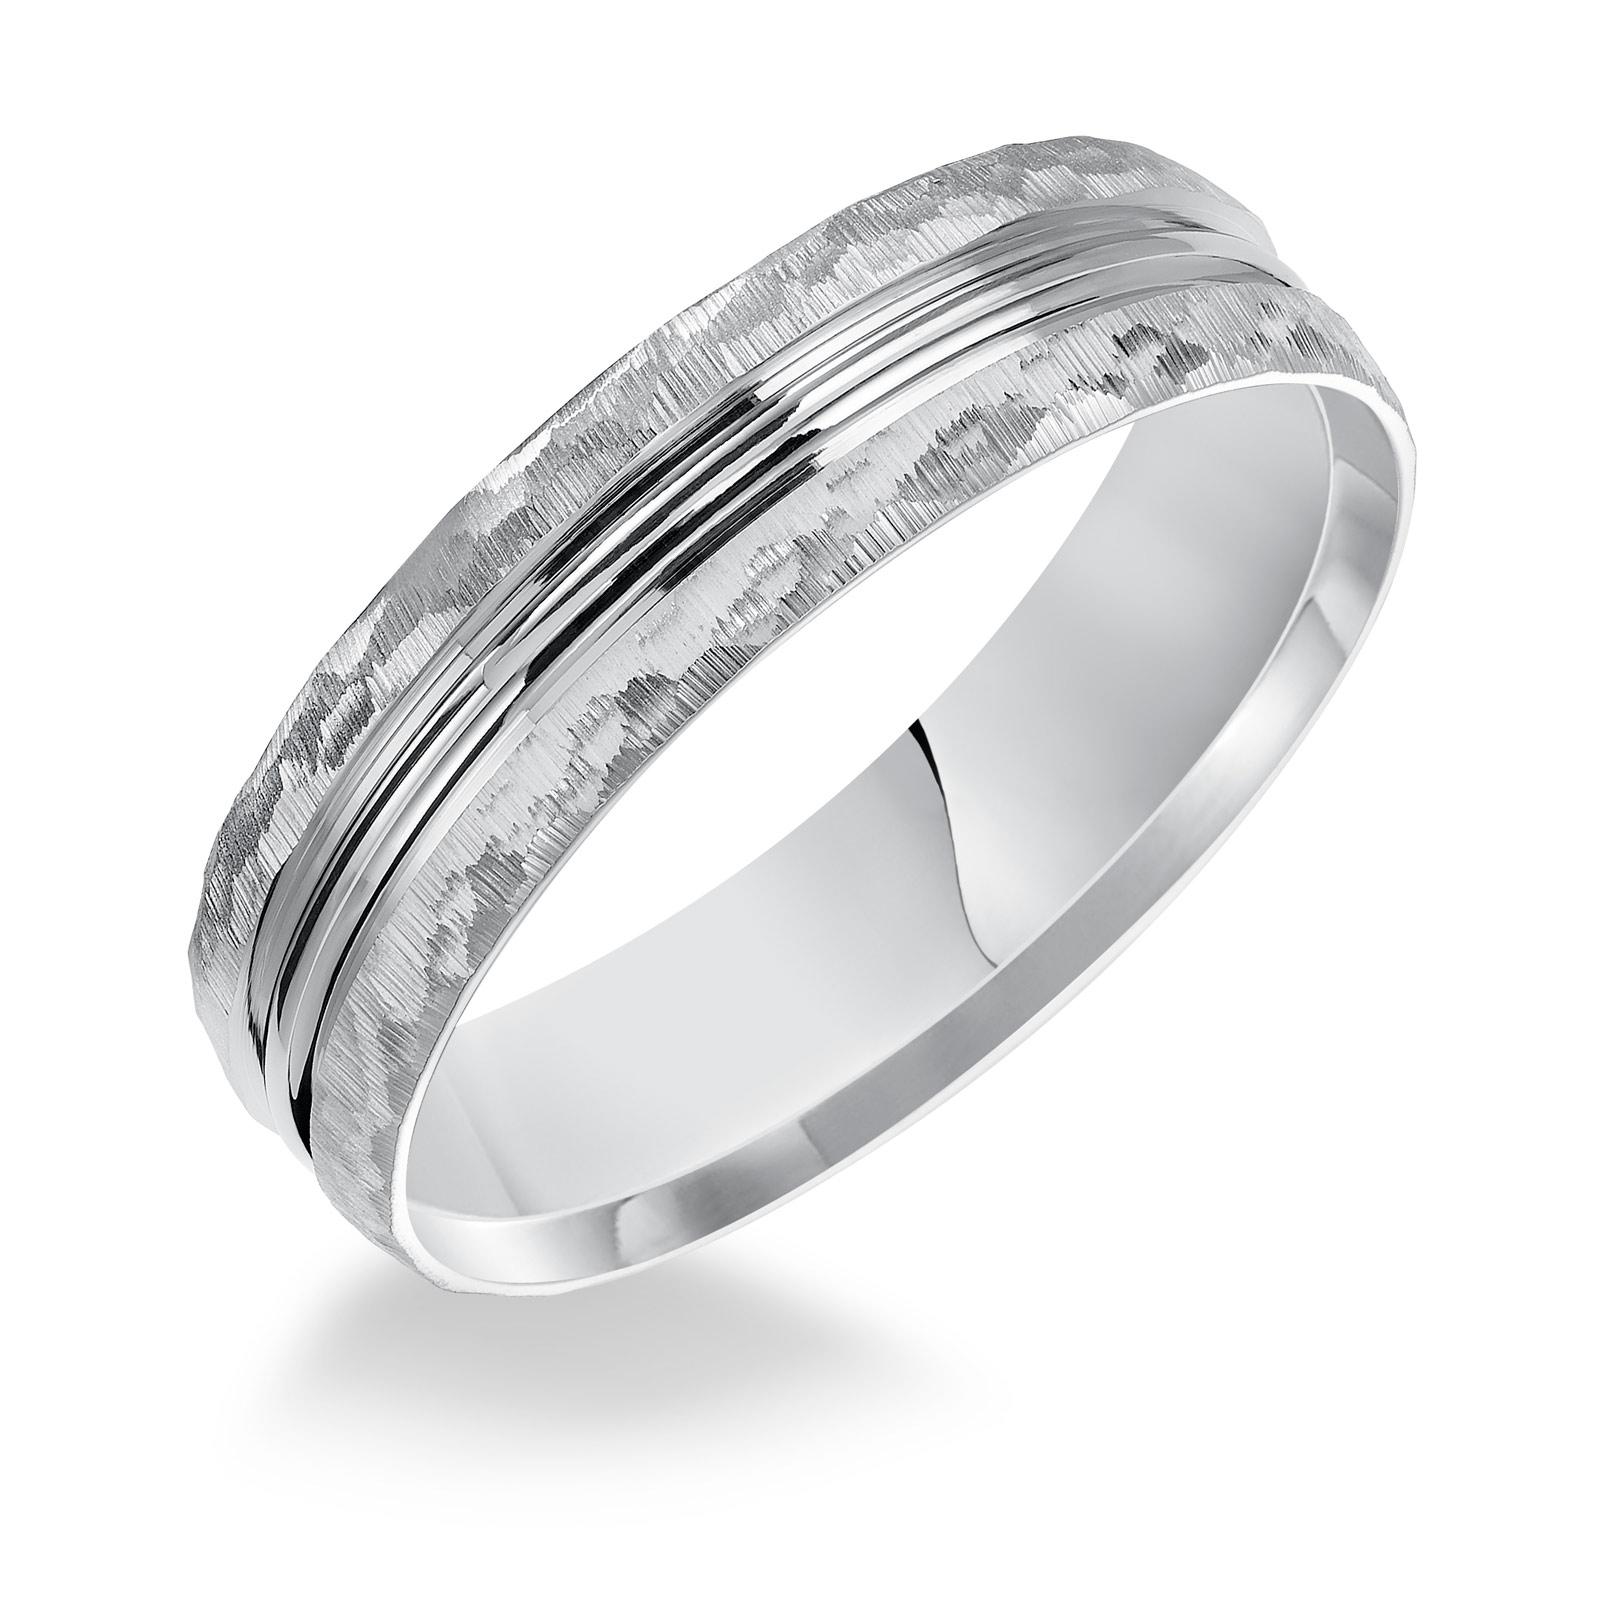 Goldman ring 11 11k4w6 g00 long island ny mens wedding for Long island wedding bands